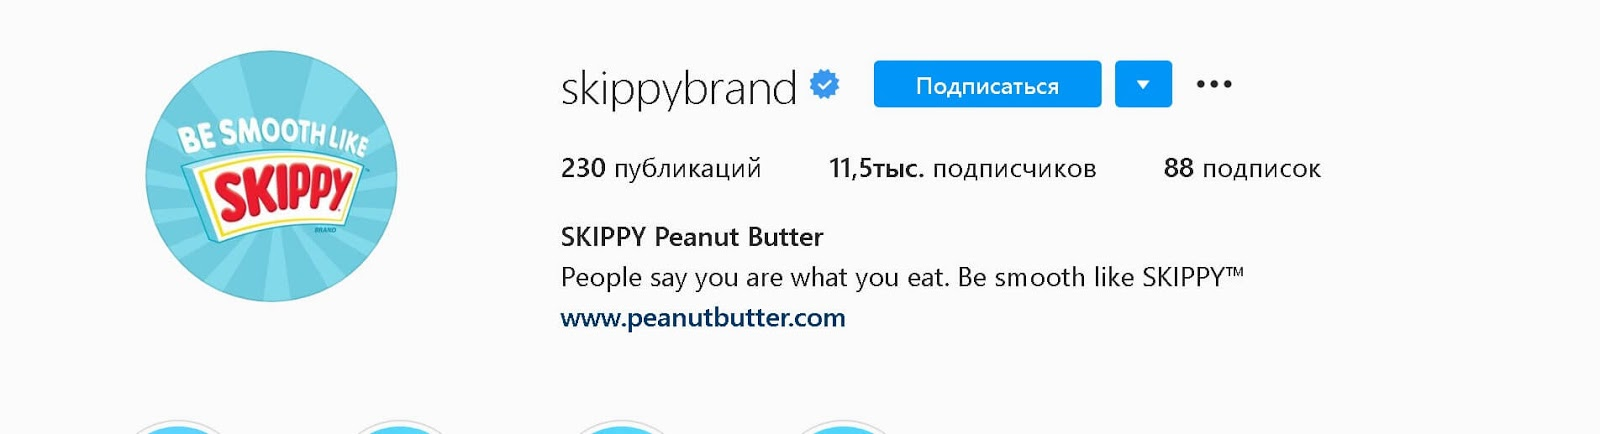 instagram-bios-skippy